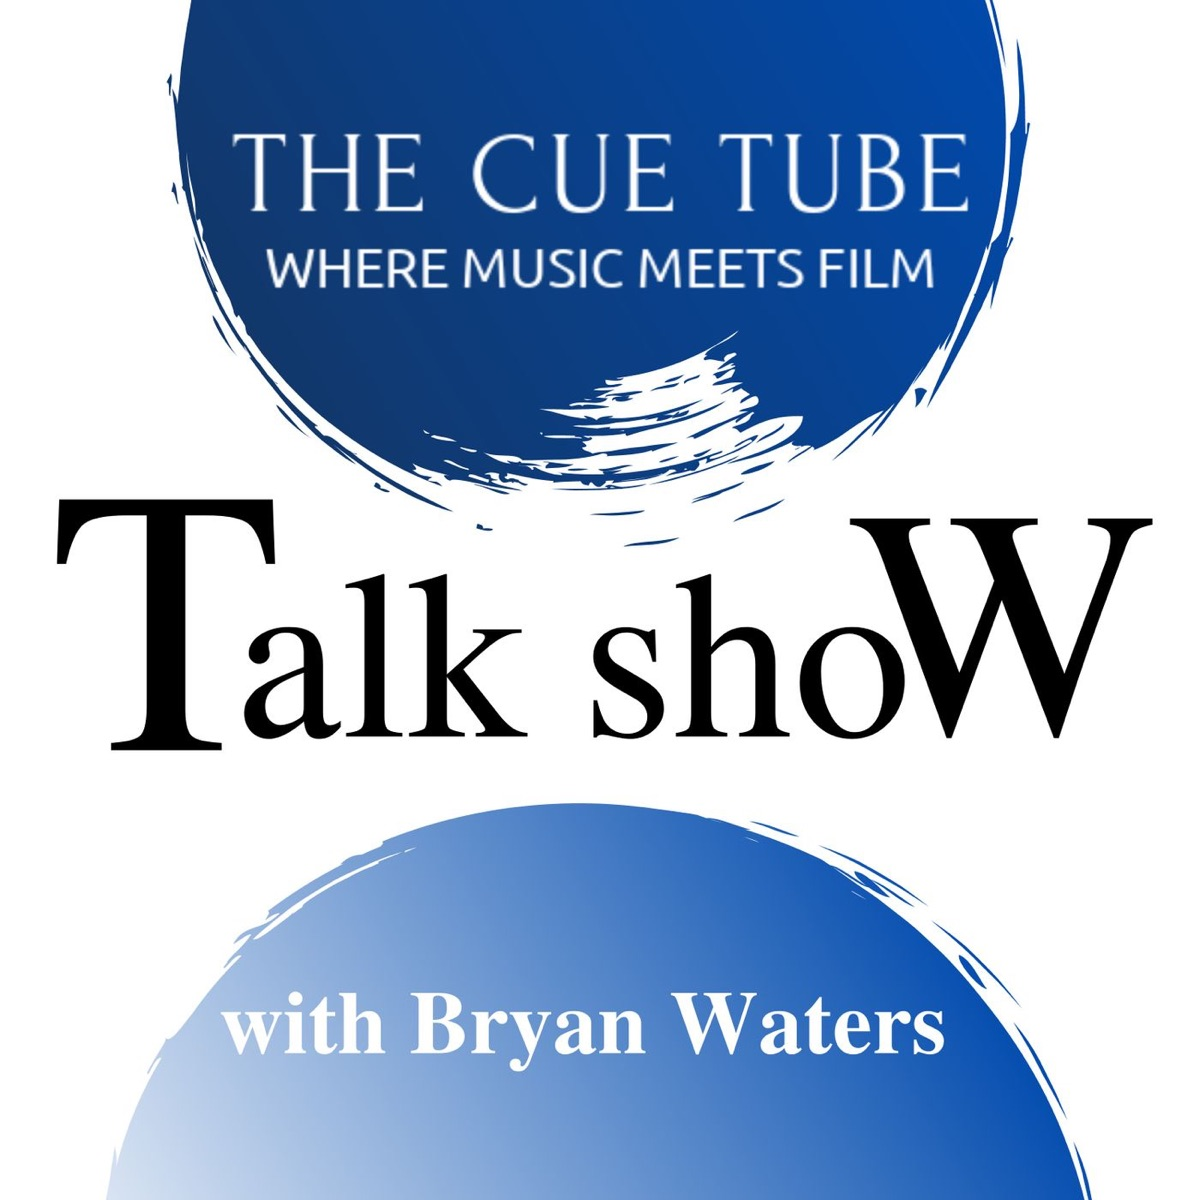 The Cue Tube - Where Music Meets Film